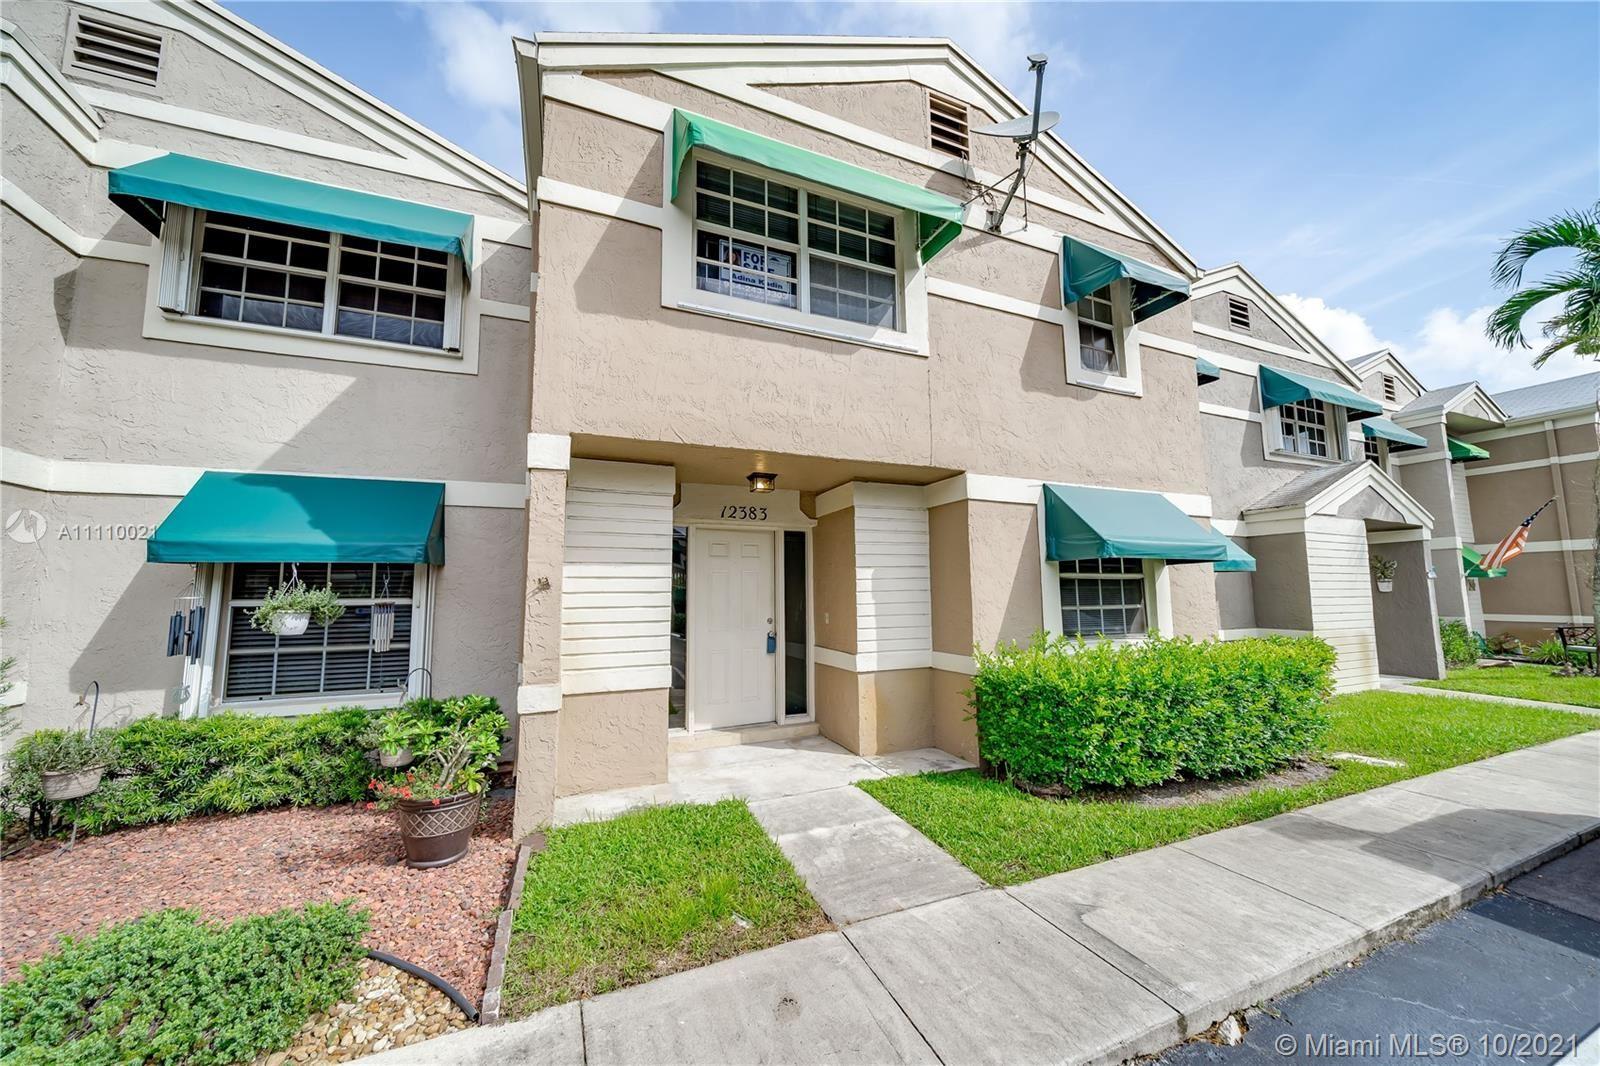 Photo of 12383 SW 52nd St #12383, Cooper City, FL 33330 (MLS # A11110021)